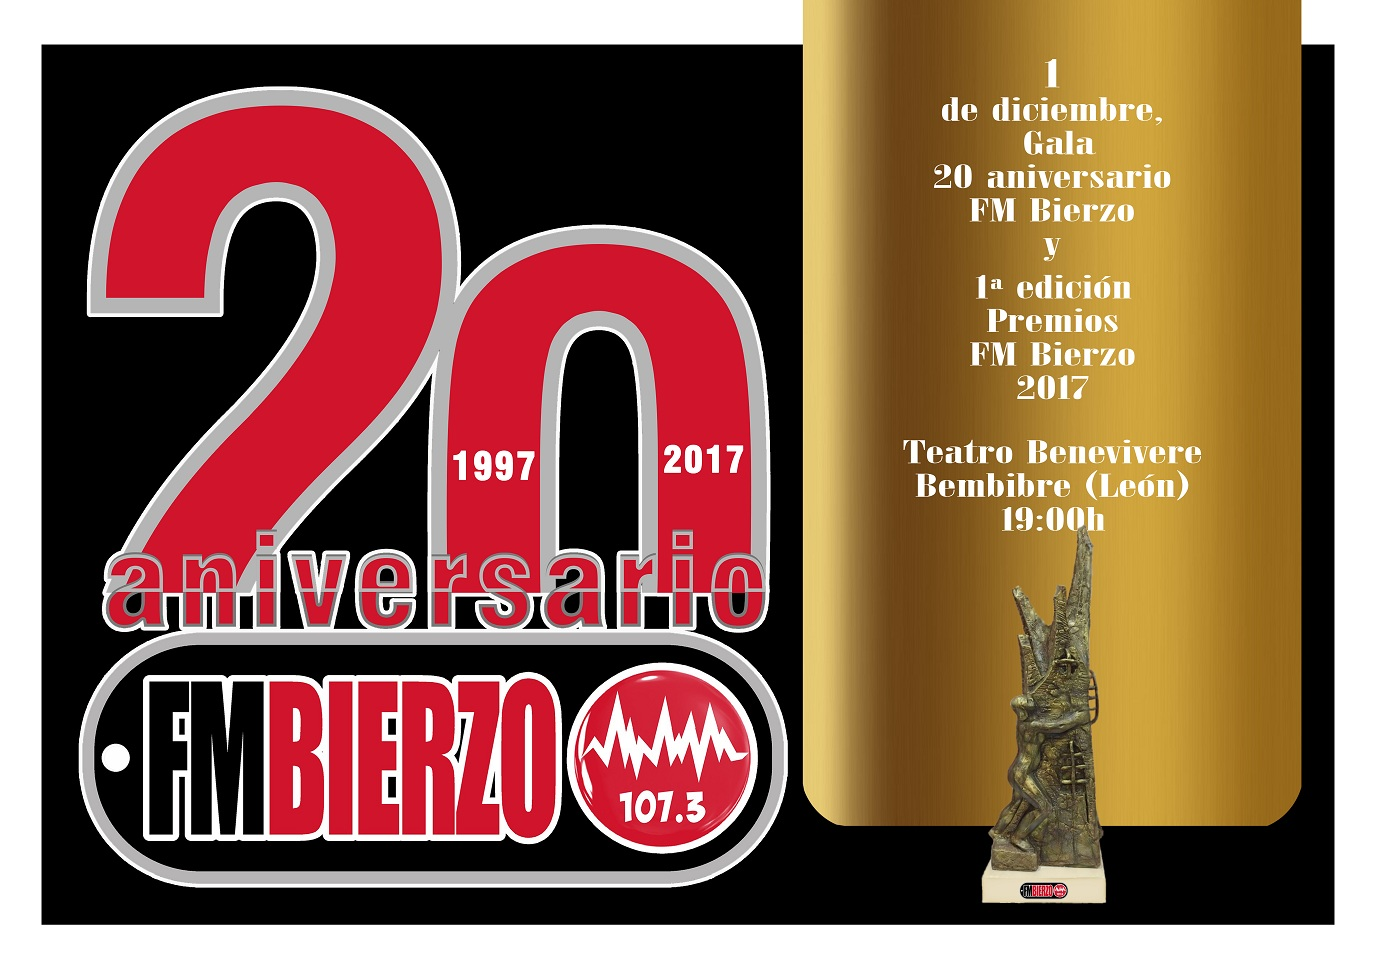 Nacen los premios FM Bierzo 2